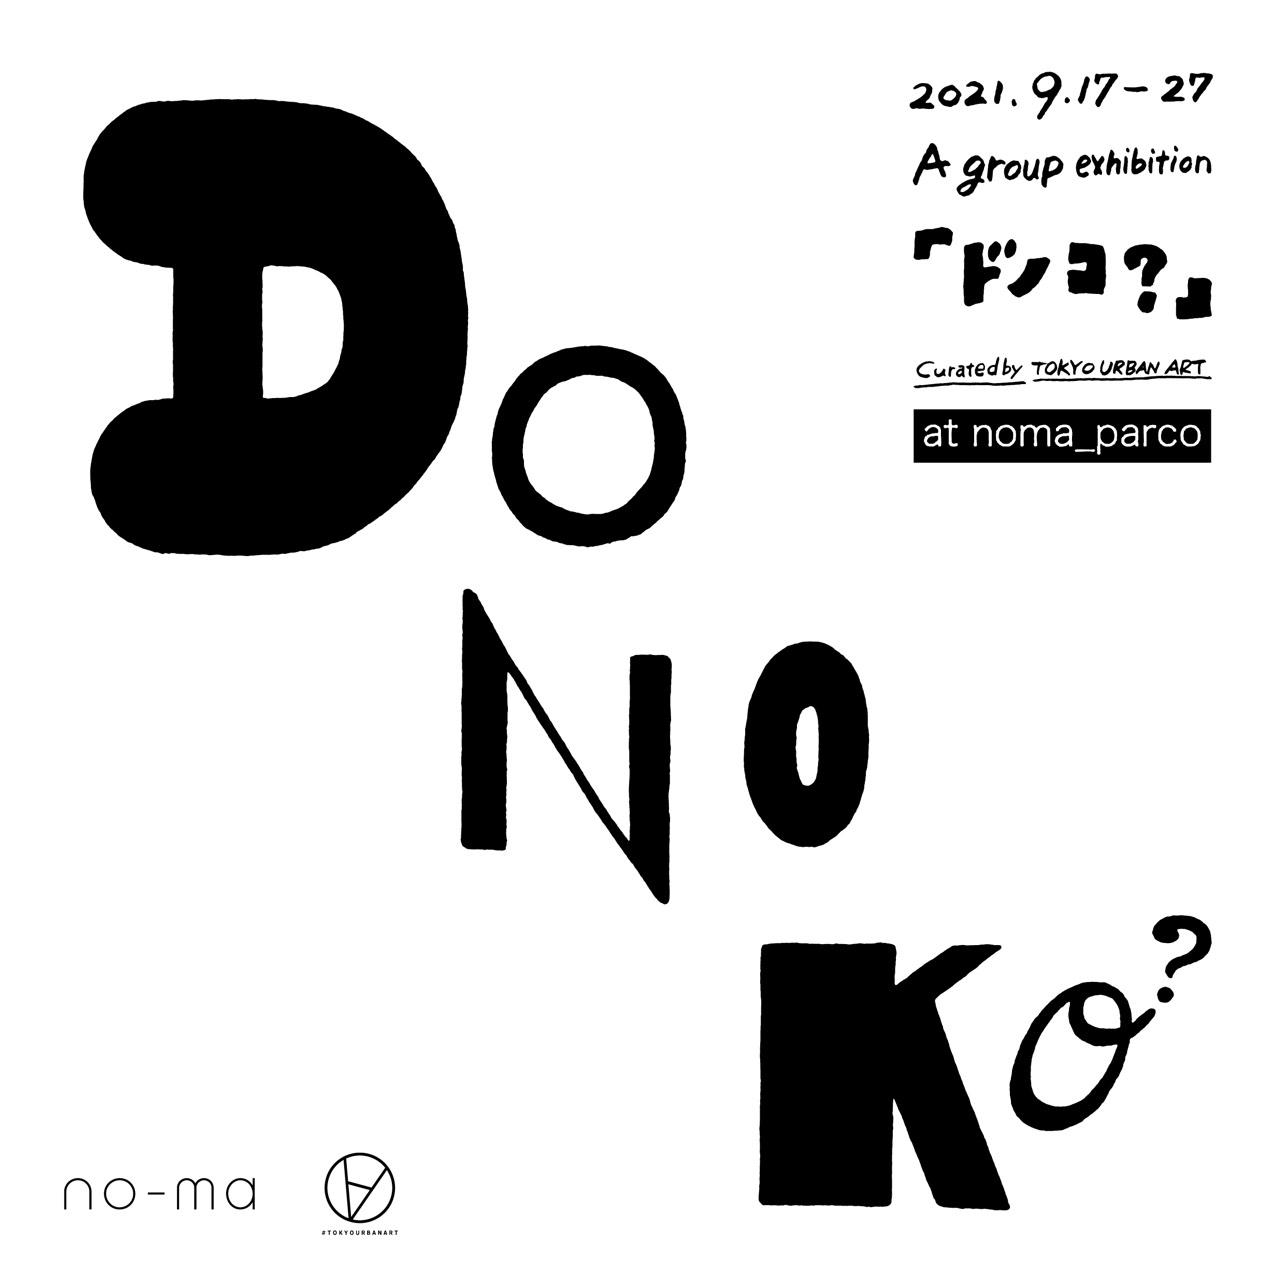 shibuya-parco-art-week-202115-2